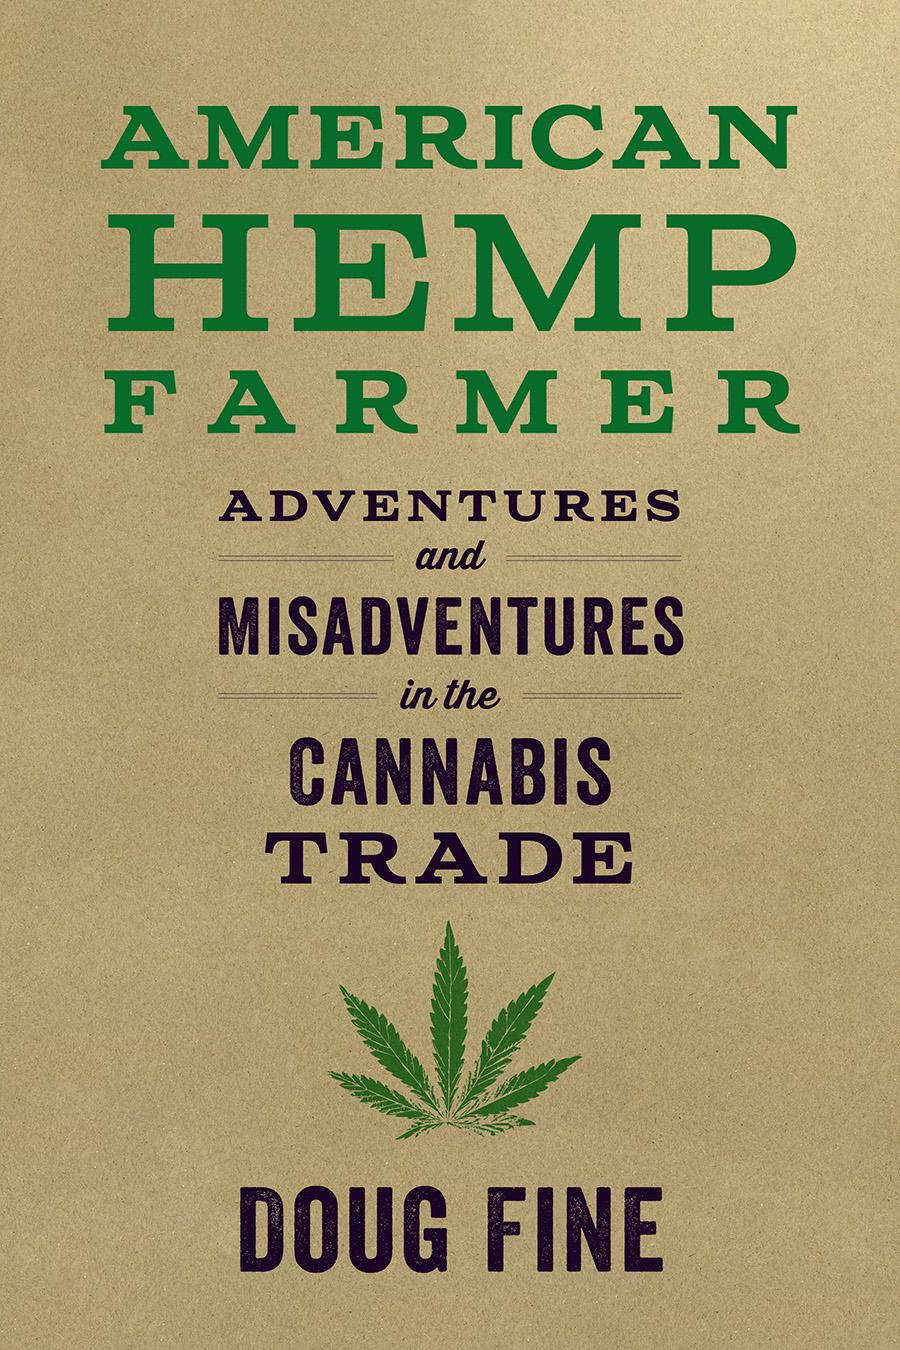 The American Hemp Farmer cover